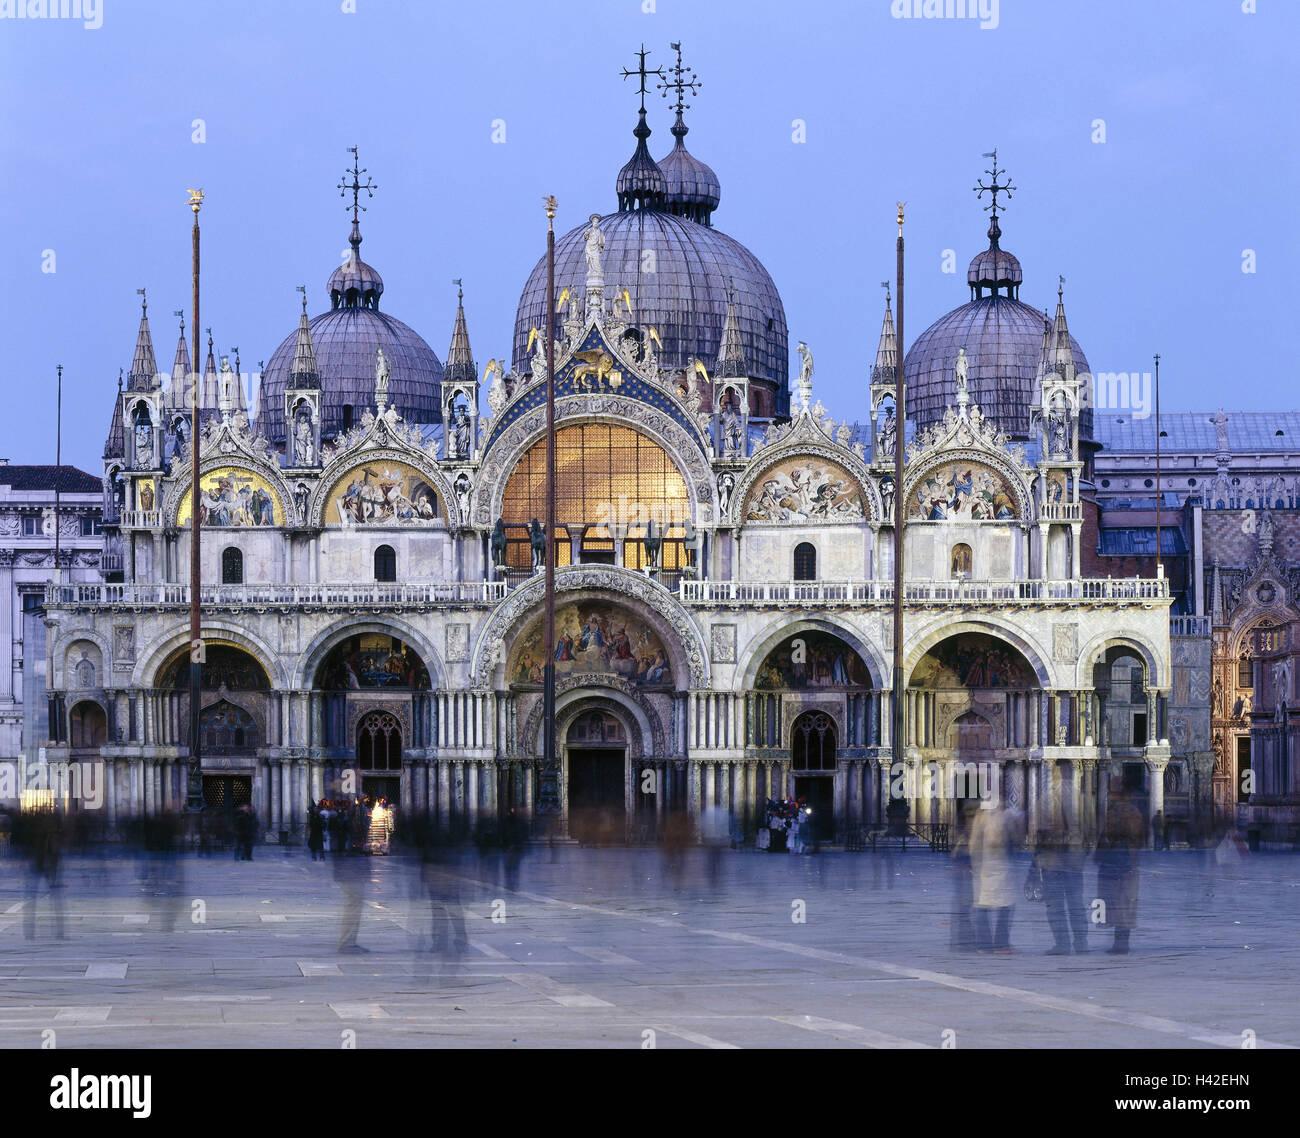 Italia, Venecia, Piazza San Marco, la Plaza de San Marcos, la ...